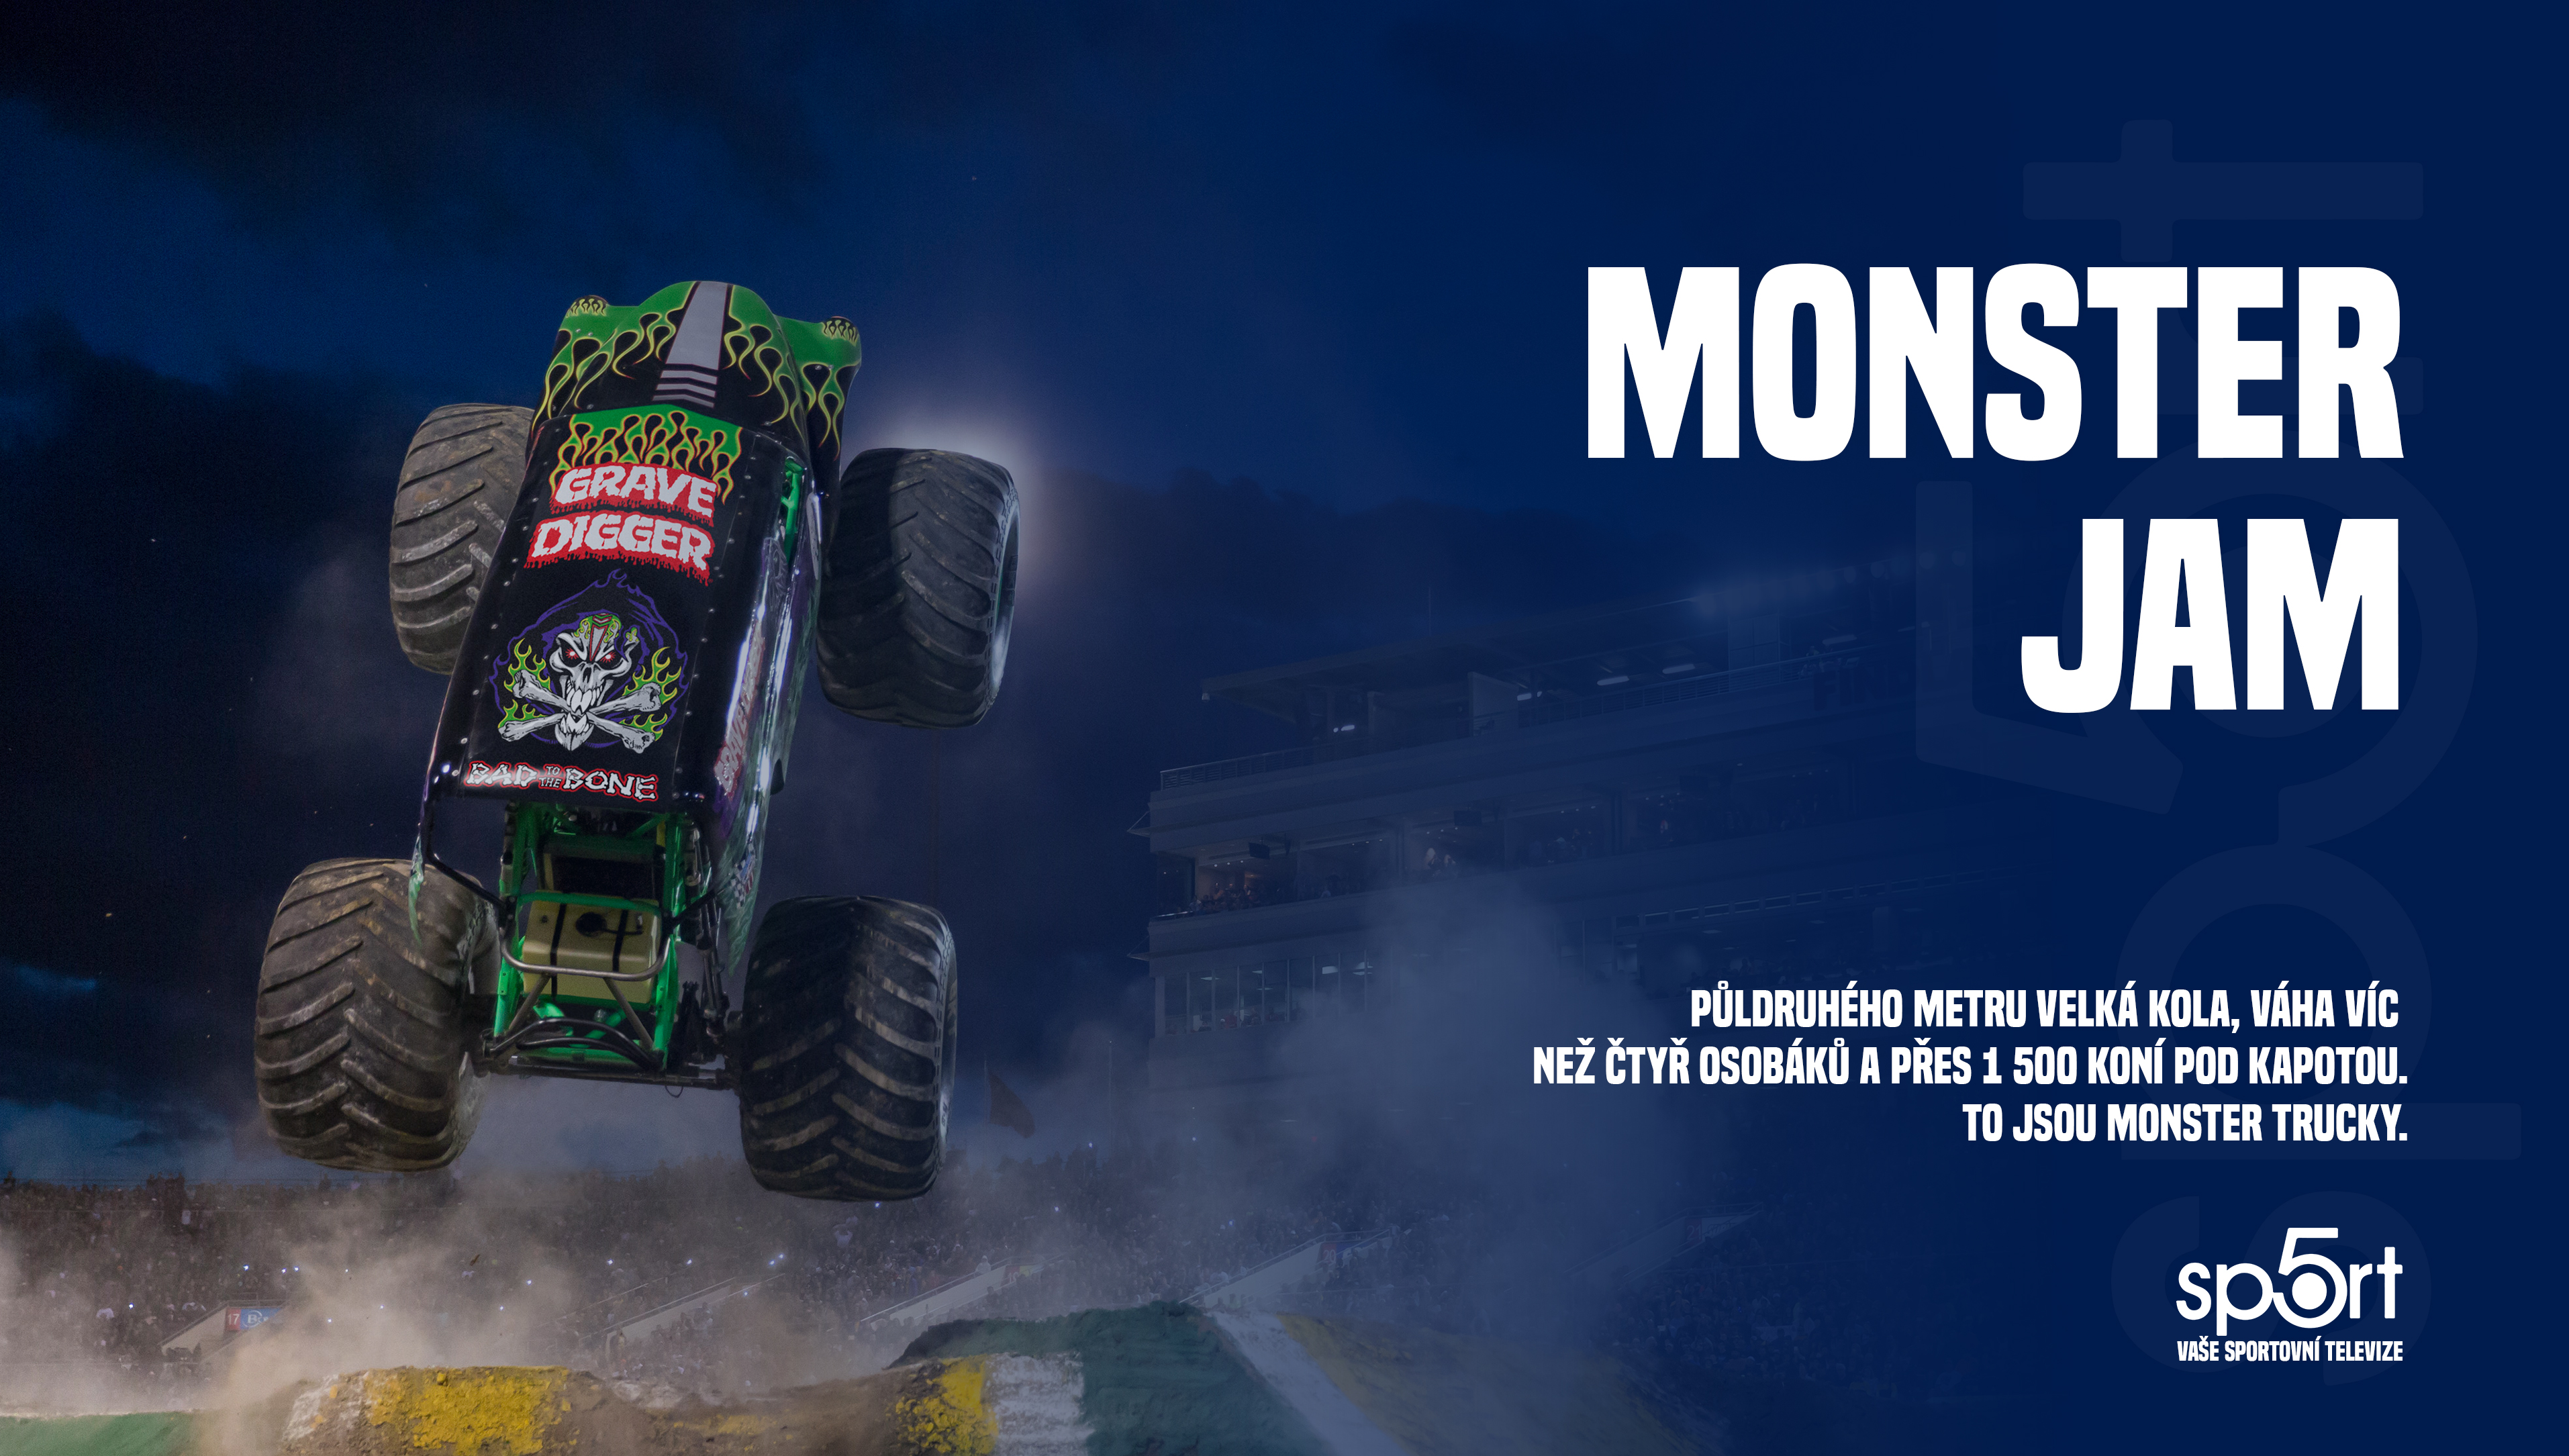 Nová rodinná zábava na SPORT 5! Monster Jam Series!